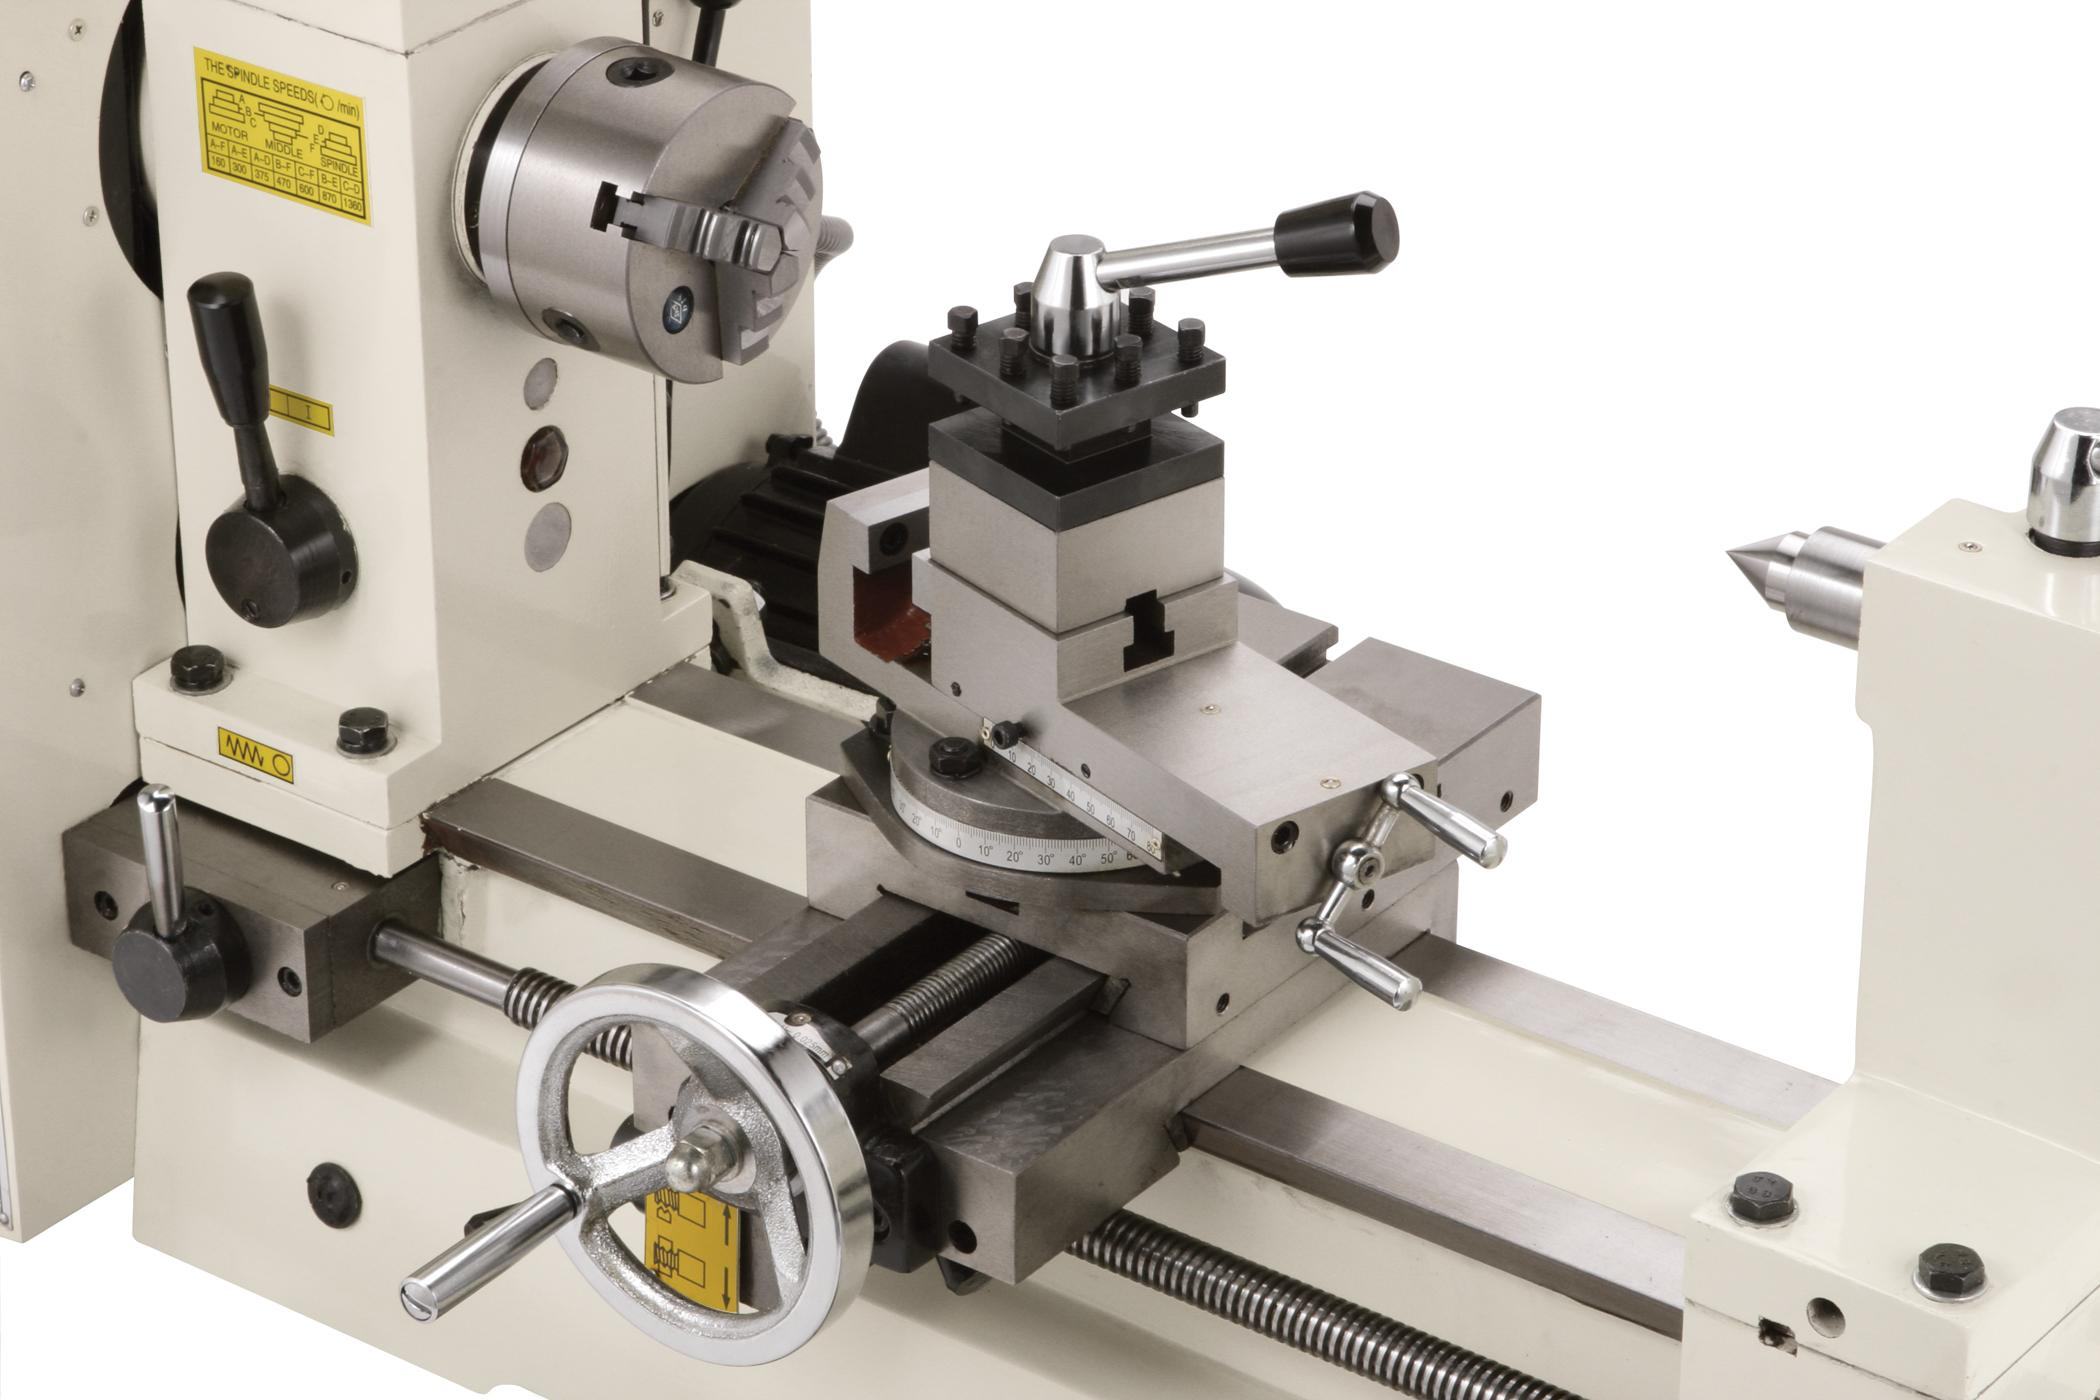 Shop Fox M1018 Small Combo Lathe Mill Amazonca Tools Home